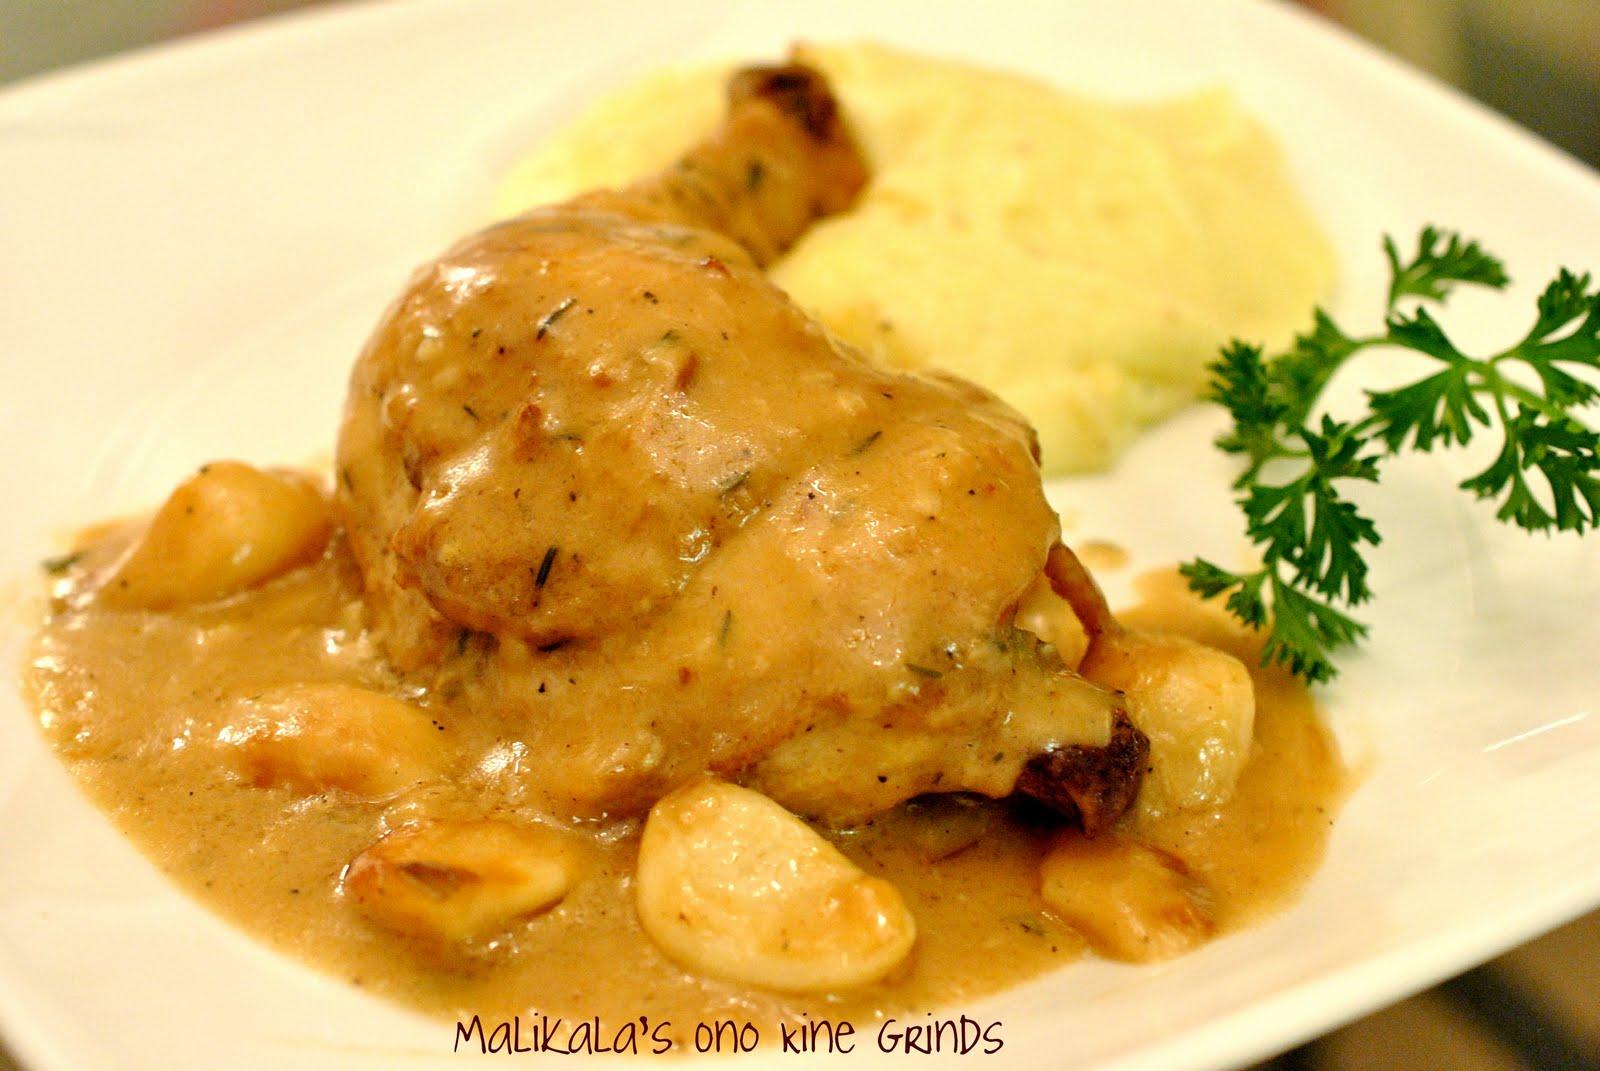 Malikala's Ono Kine Grinds: 40 Clove Garlic Chicken